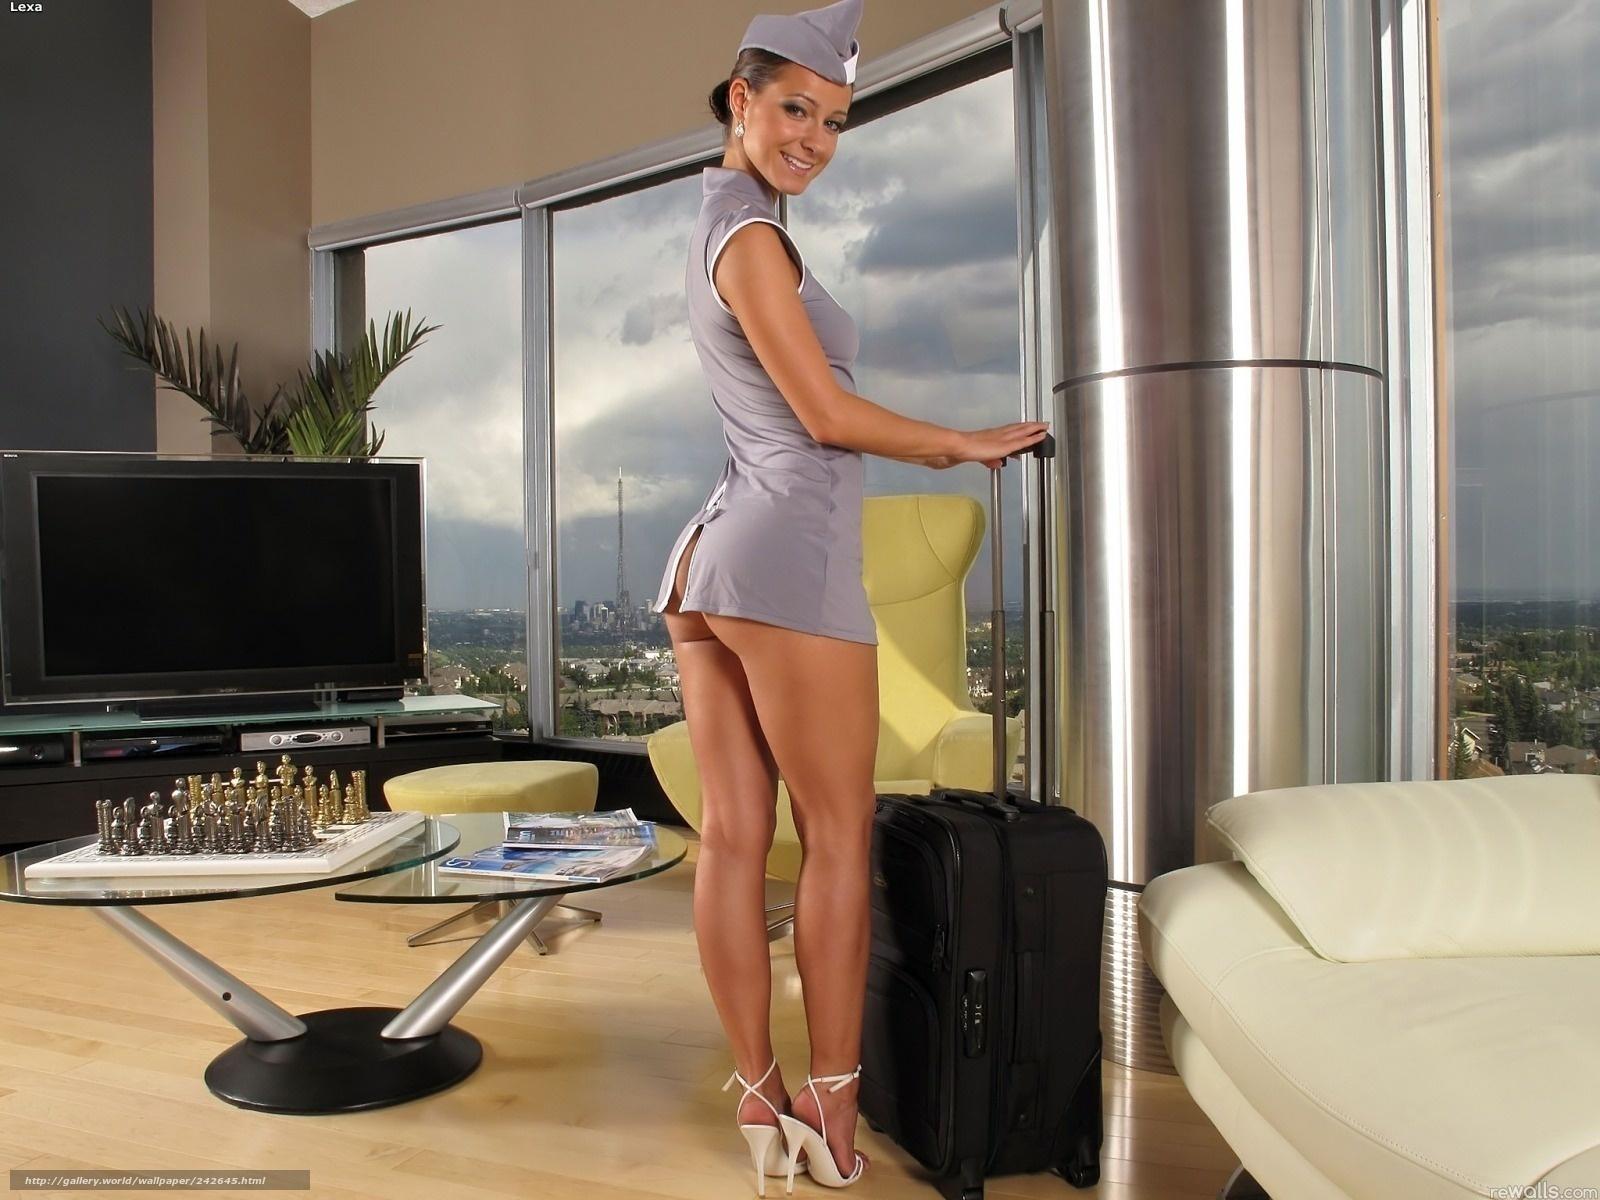 Фотогалерея еротични фото стюардеси 27 фотография